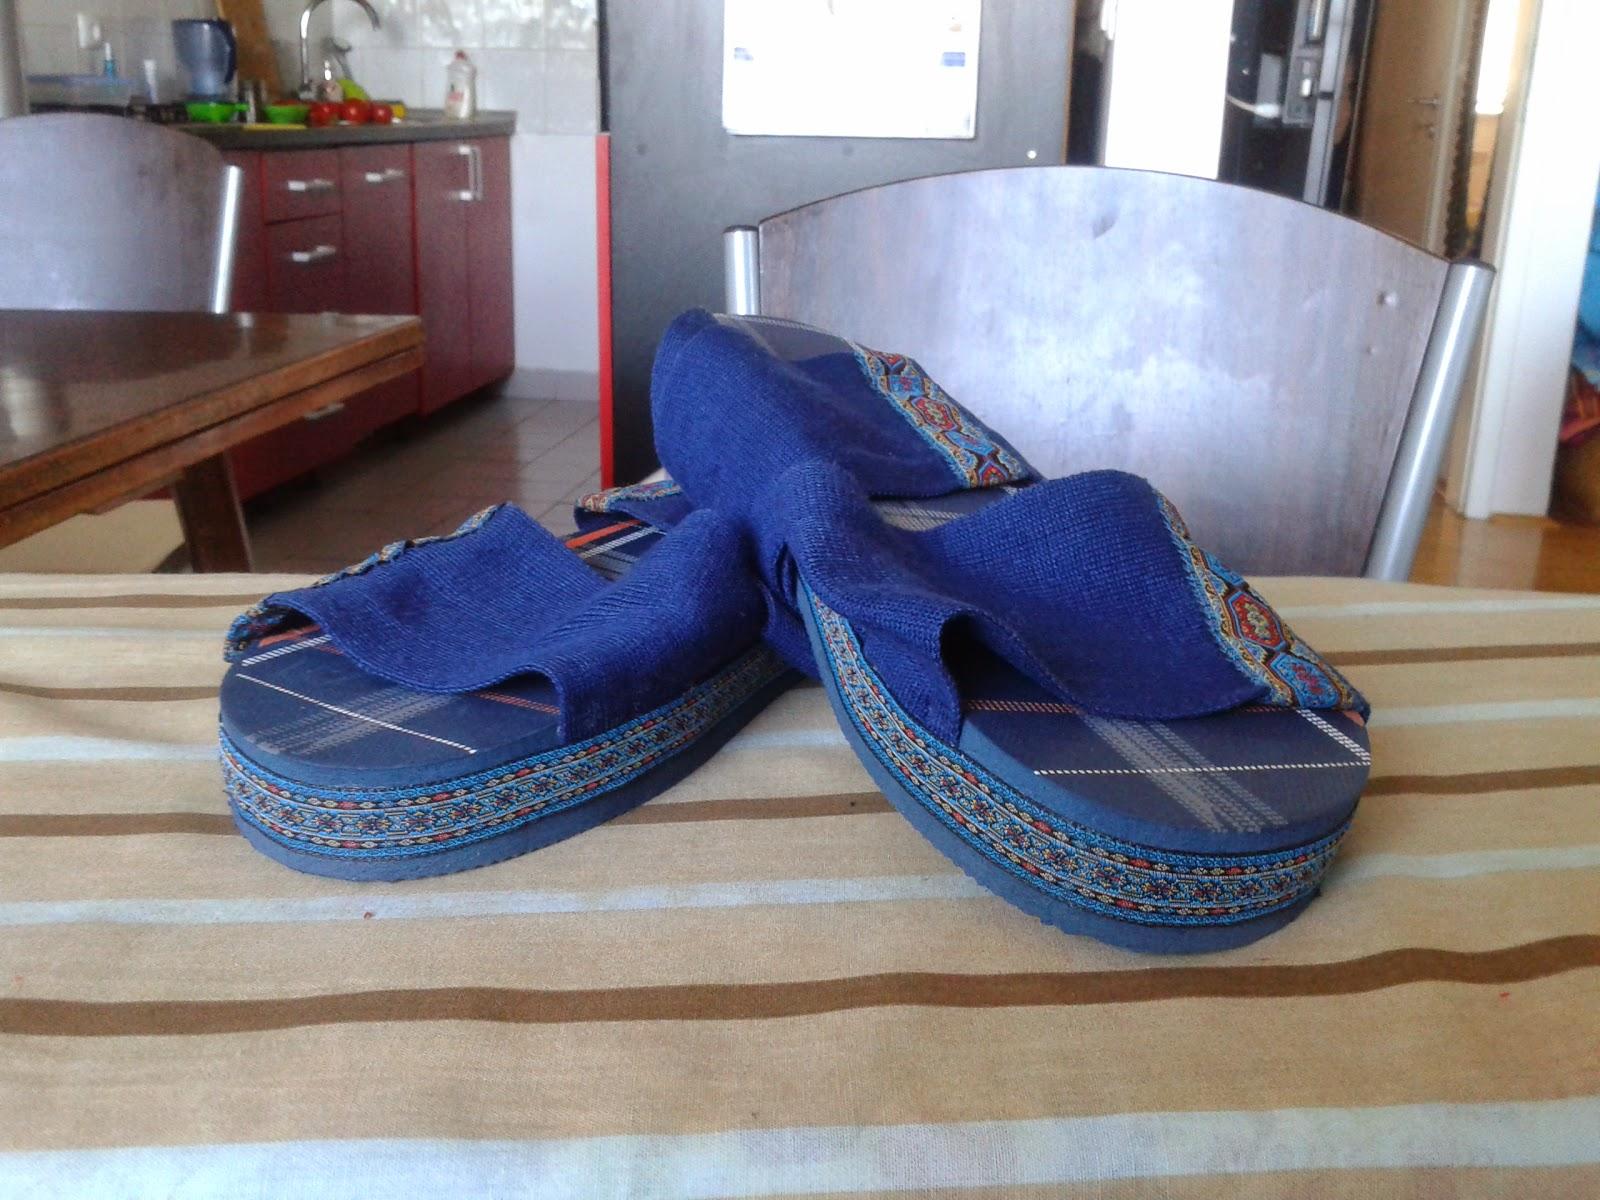 http://curvyrefash.blogspot.com/2014/07/refashion-no-4-sandals-from-flip-flops.html